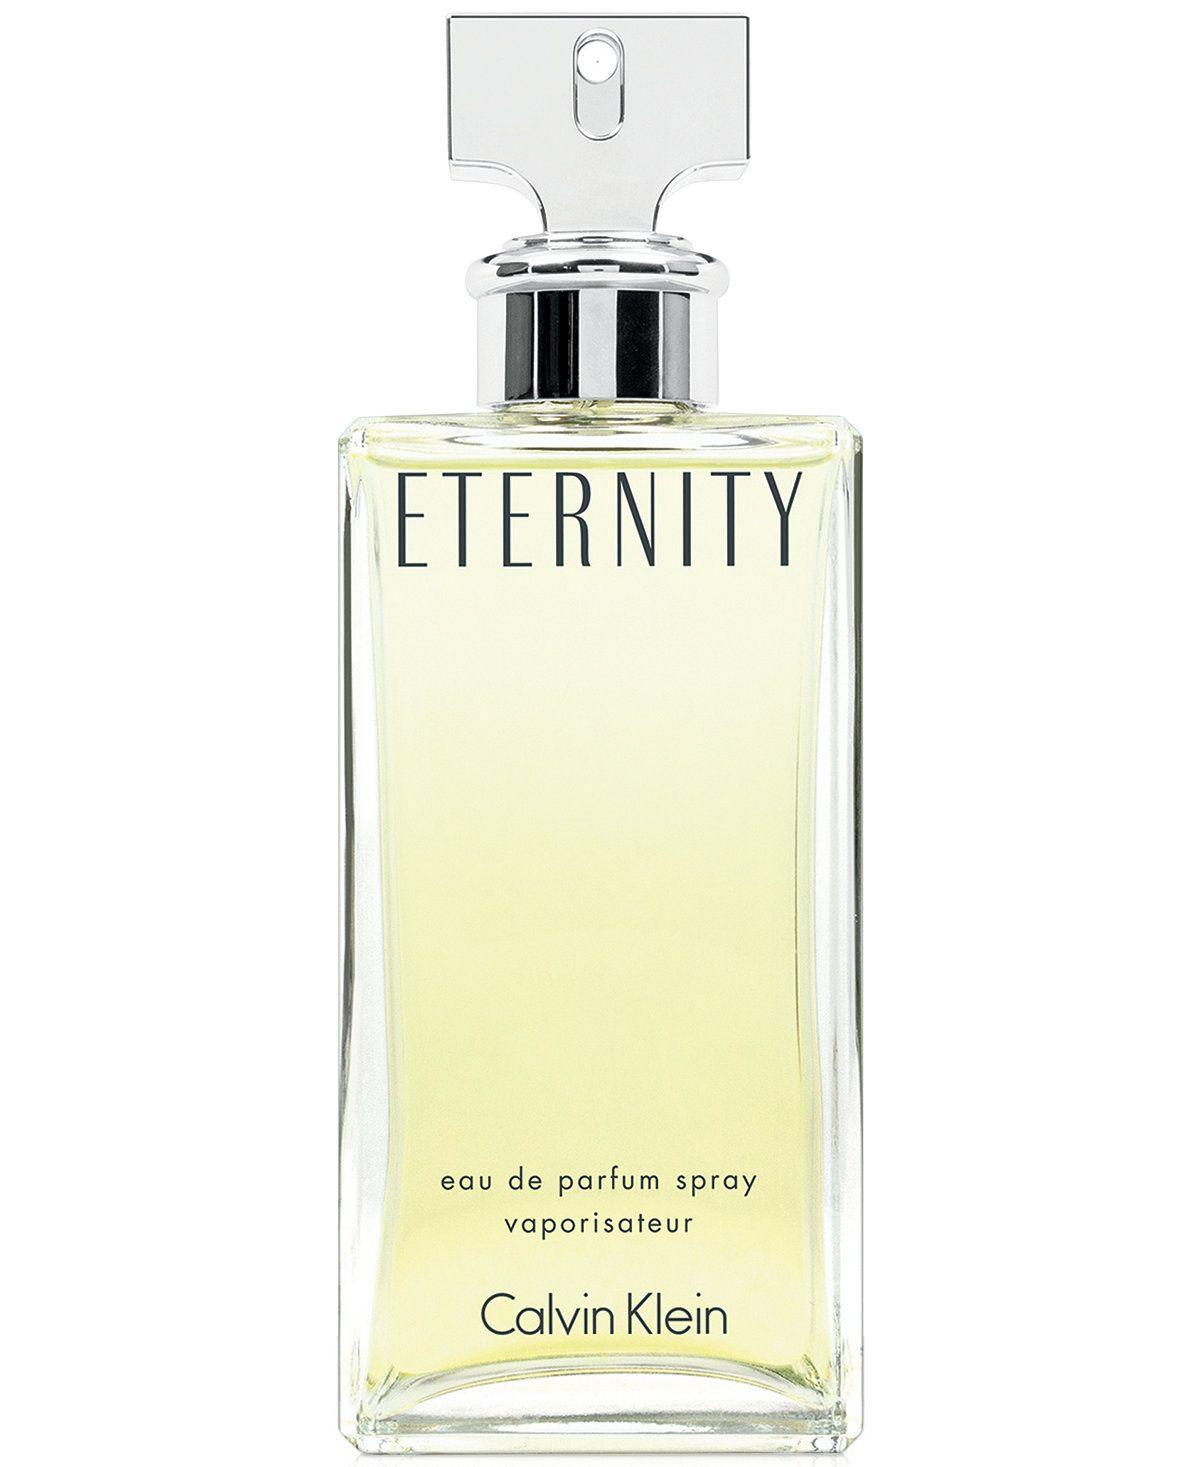 Polo Sport Woman Perfume, Eau de parfum, Fragrance